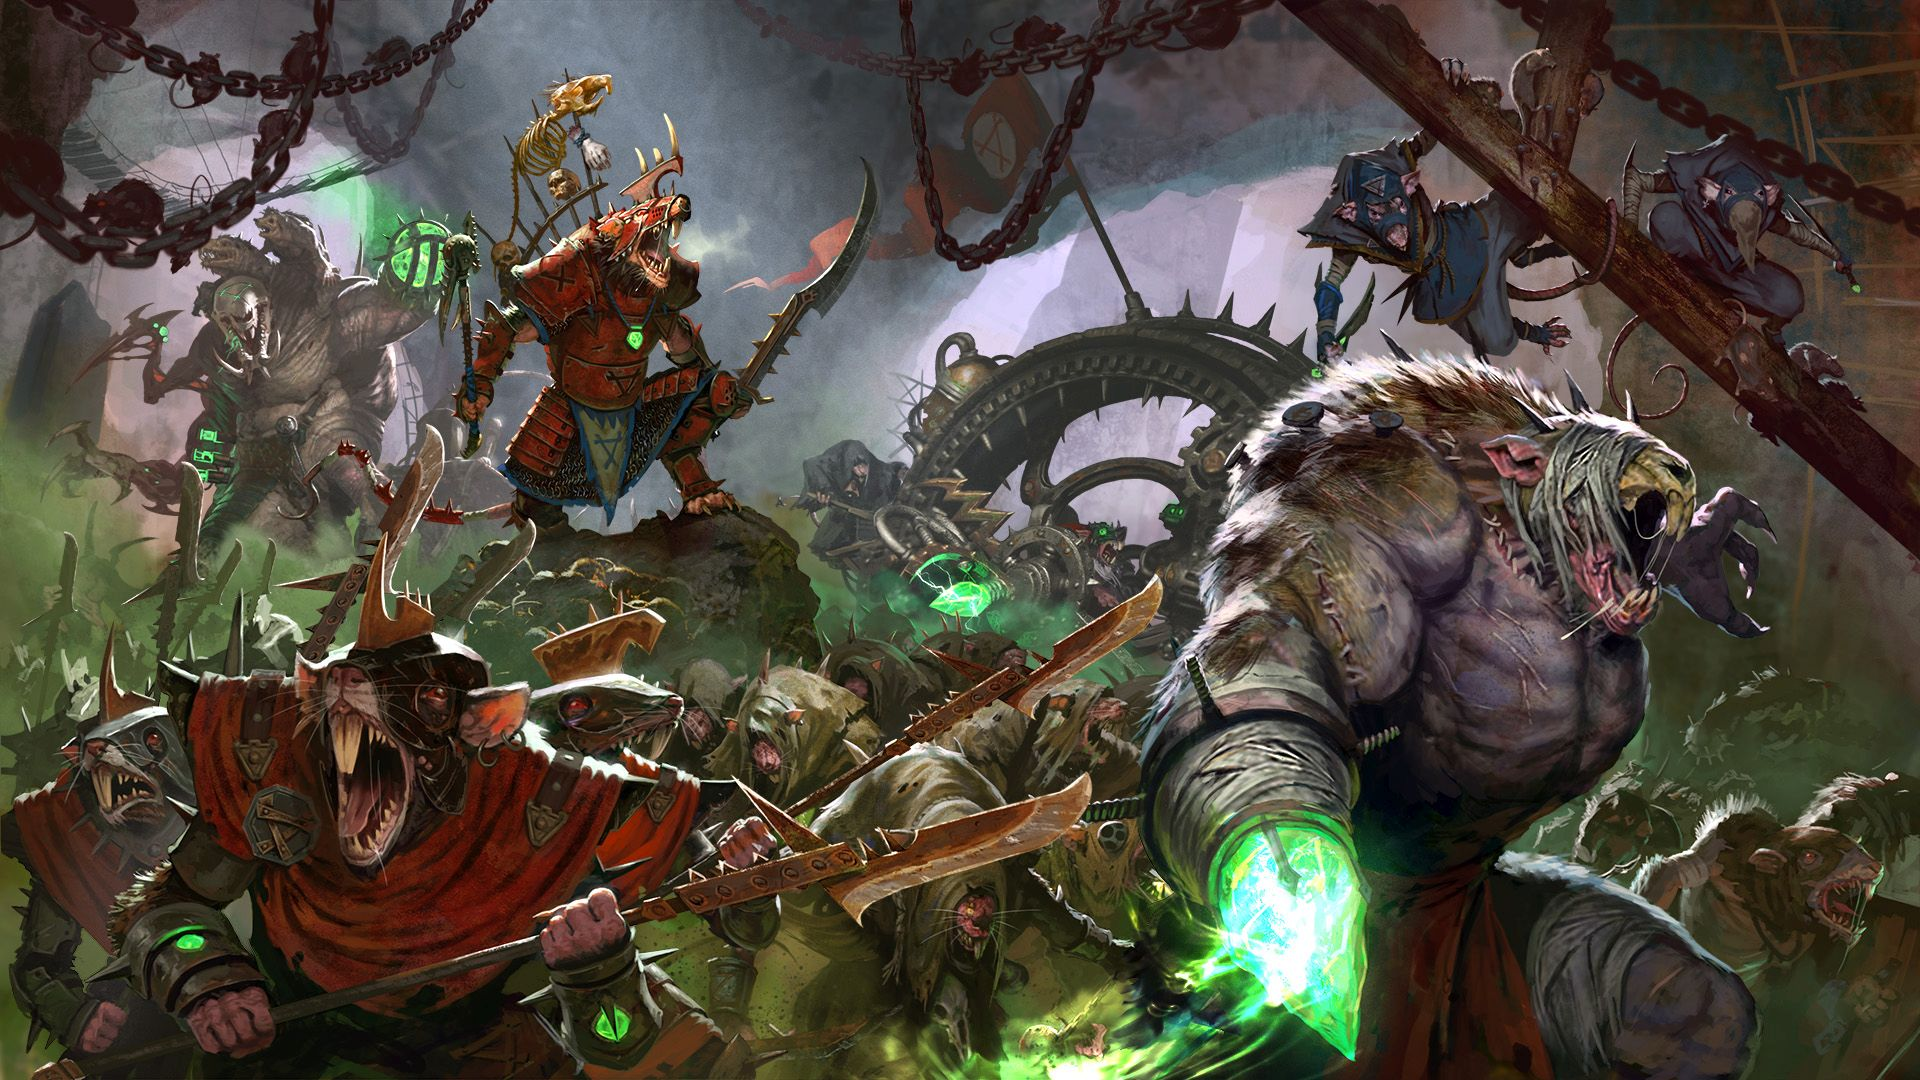 Total War Warhammer 2 planira pomaknuti računala do limita